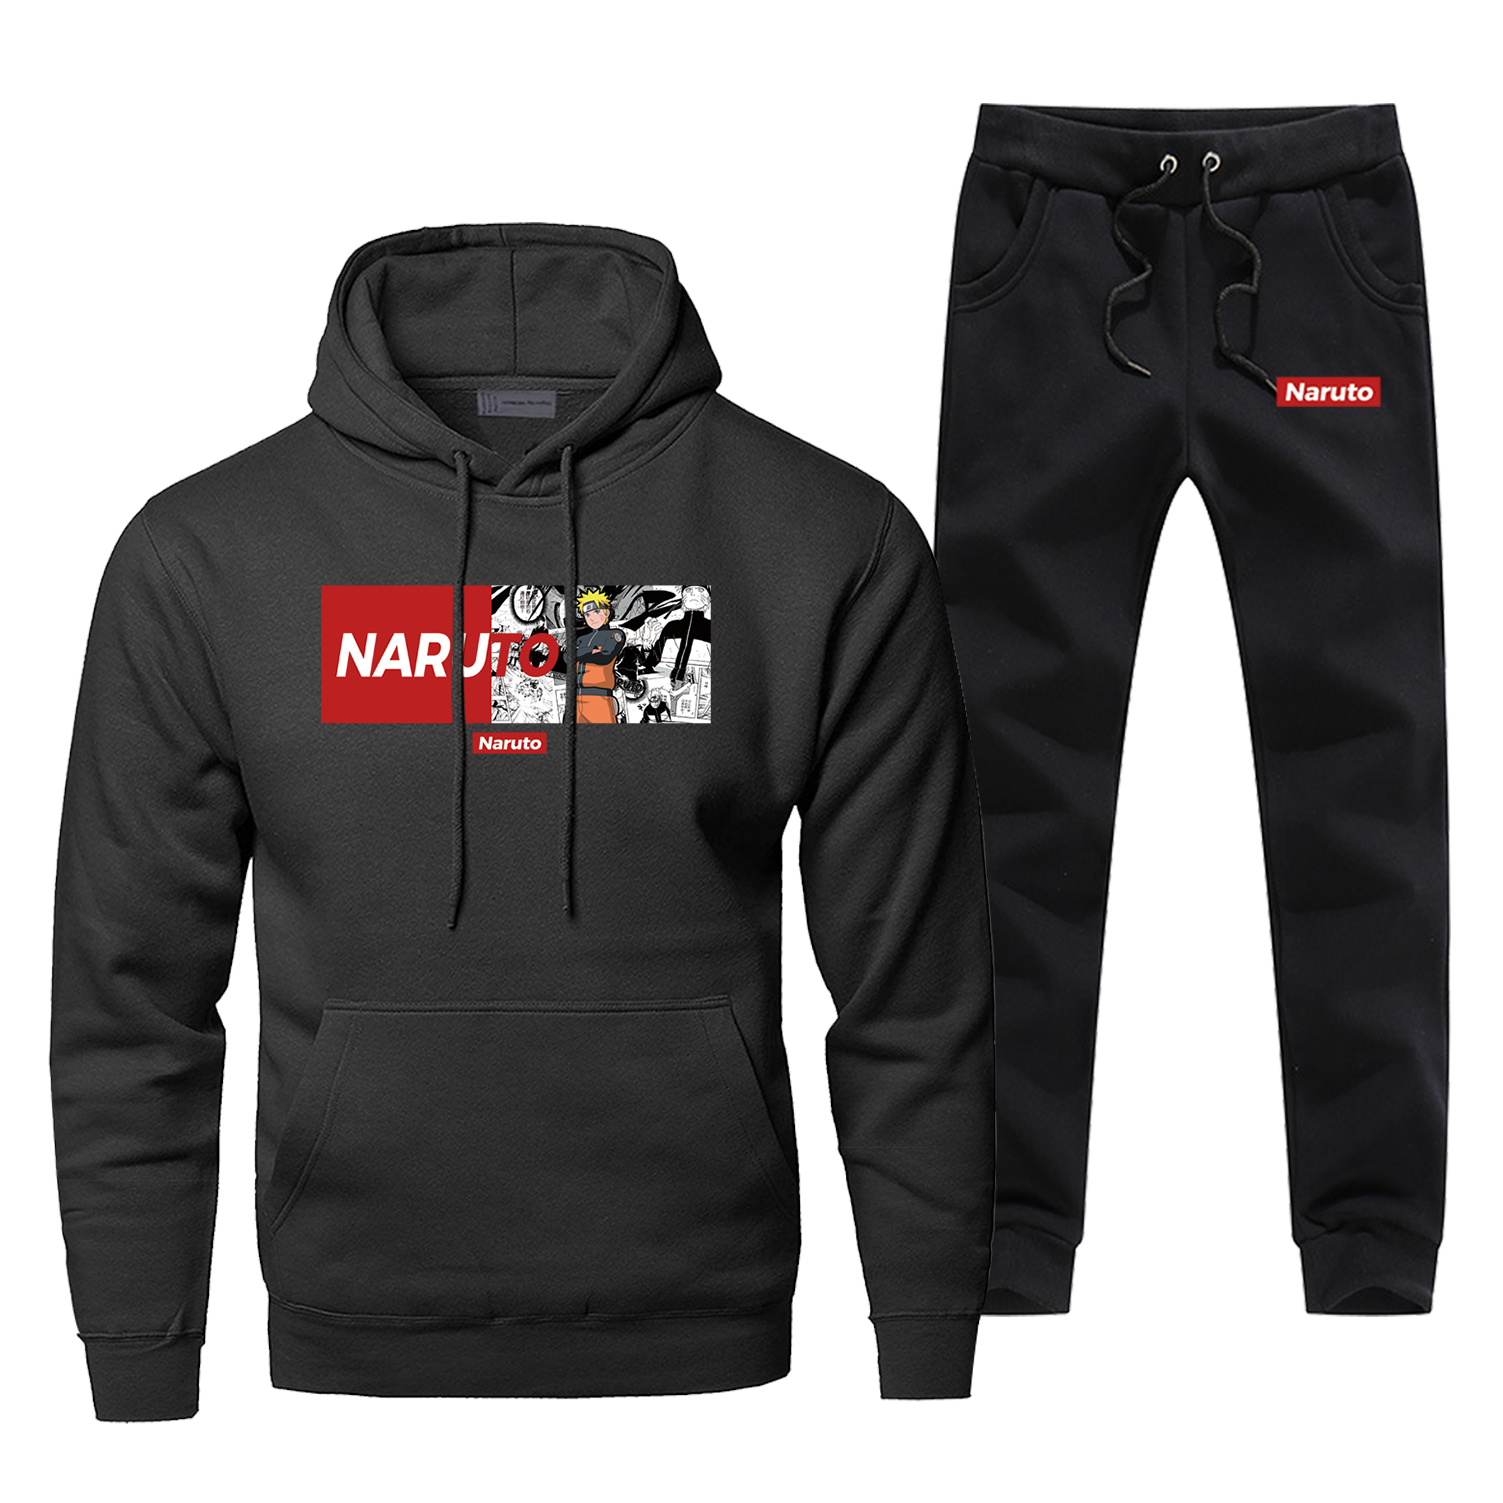 Naruto Japan Anime Hoodie Pants Set Men Sweatshirt Harajuku Male Hoodies Sweatshirts Mens Sets Two Piece Pant Pullover Hood Coat